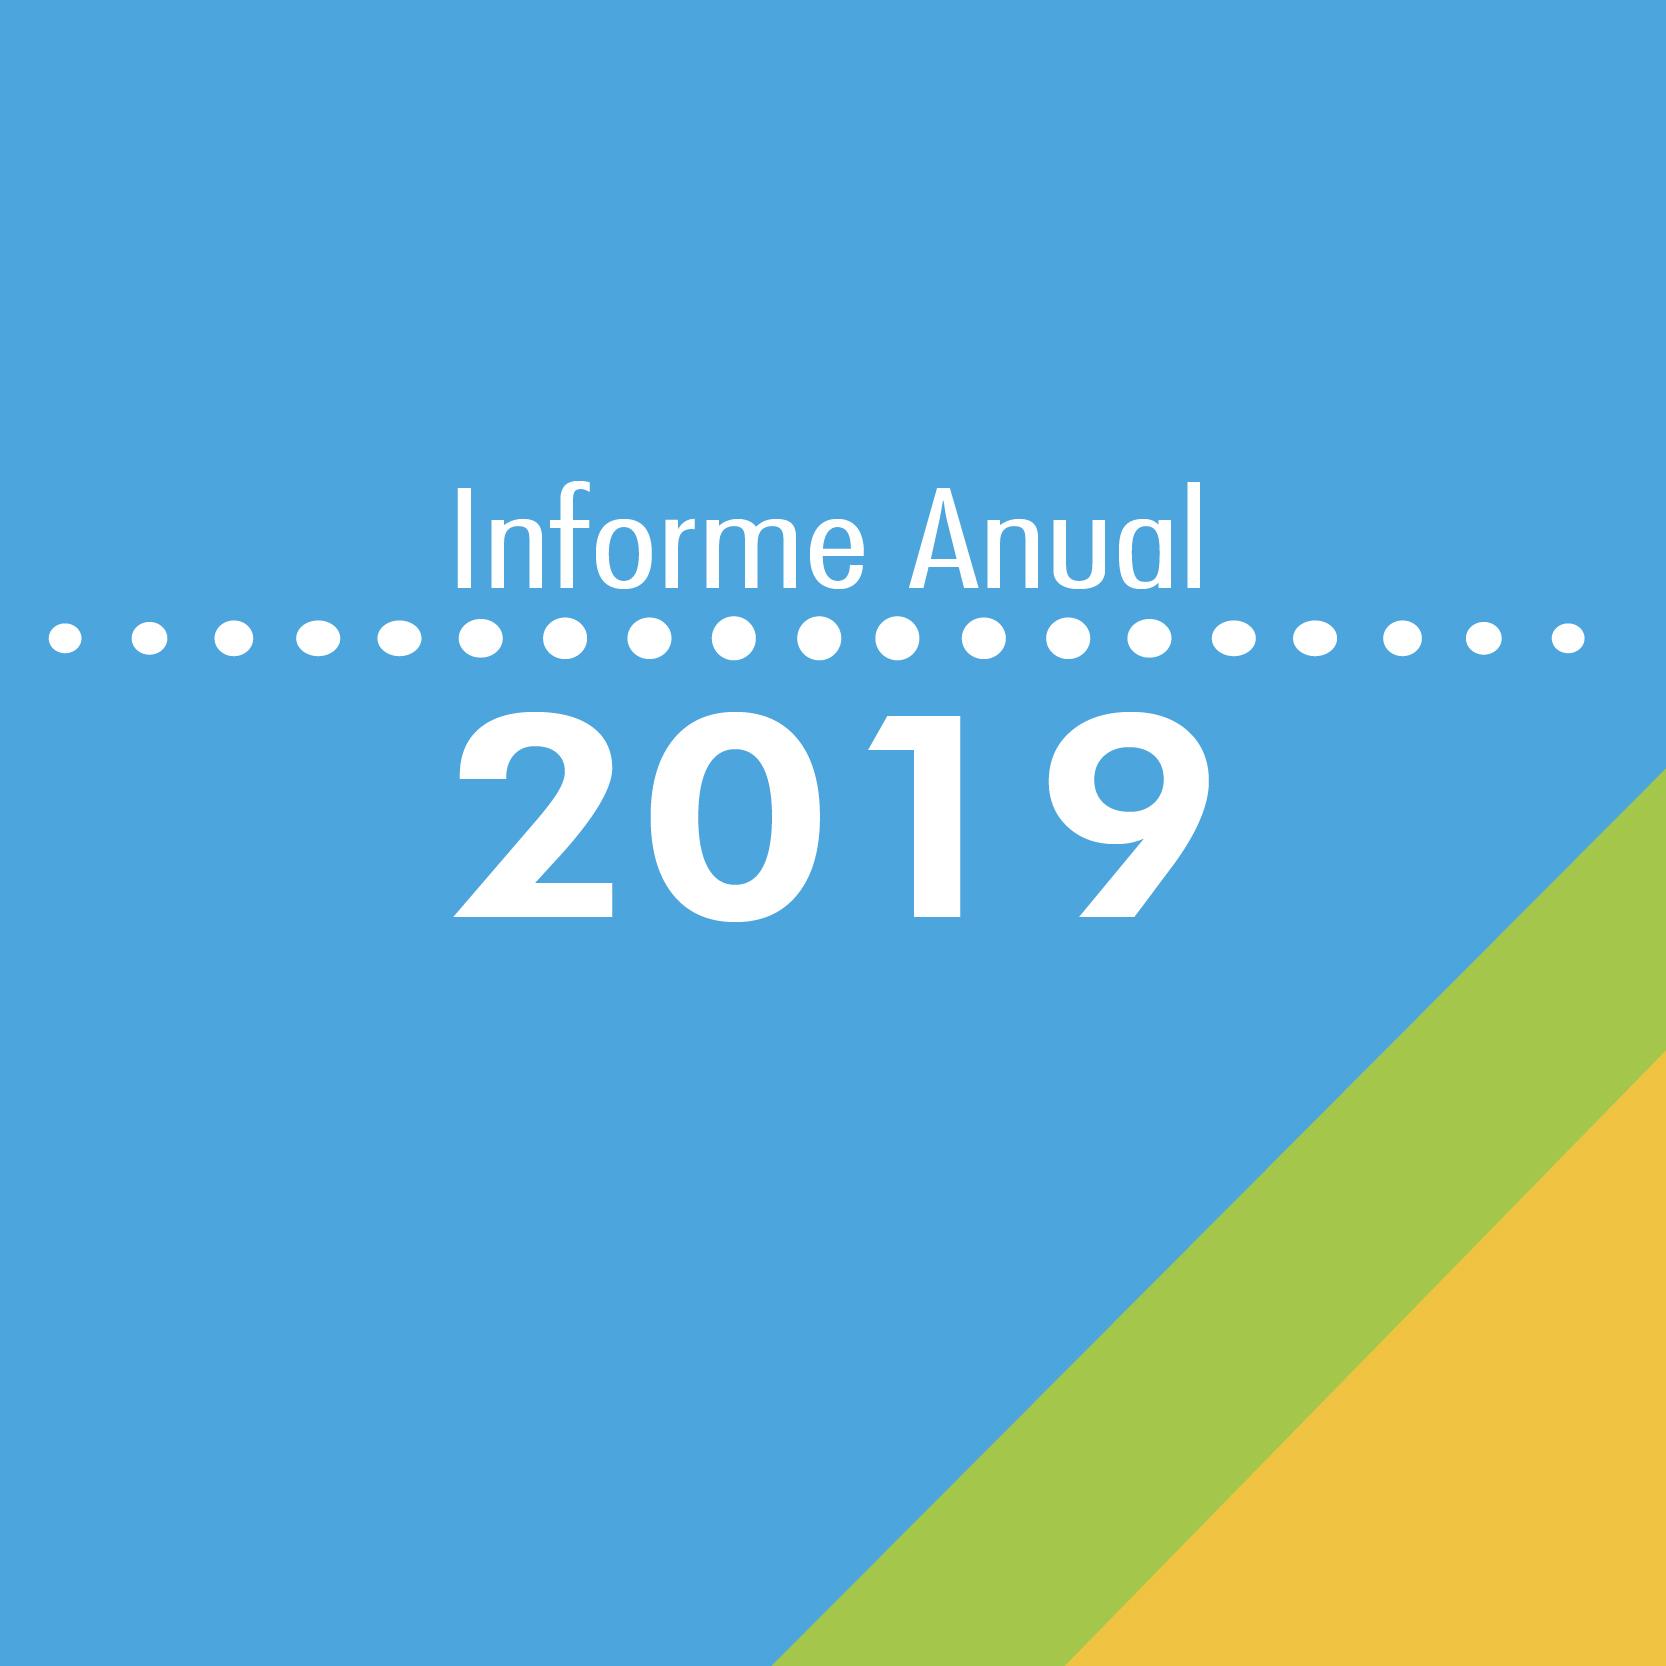 Informe 2019